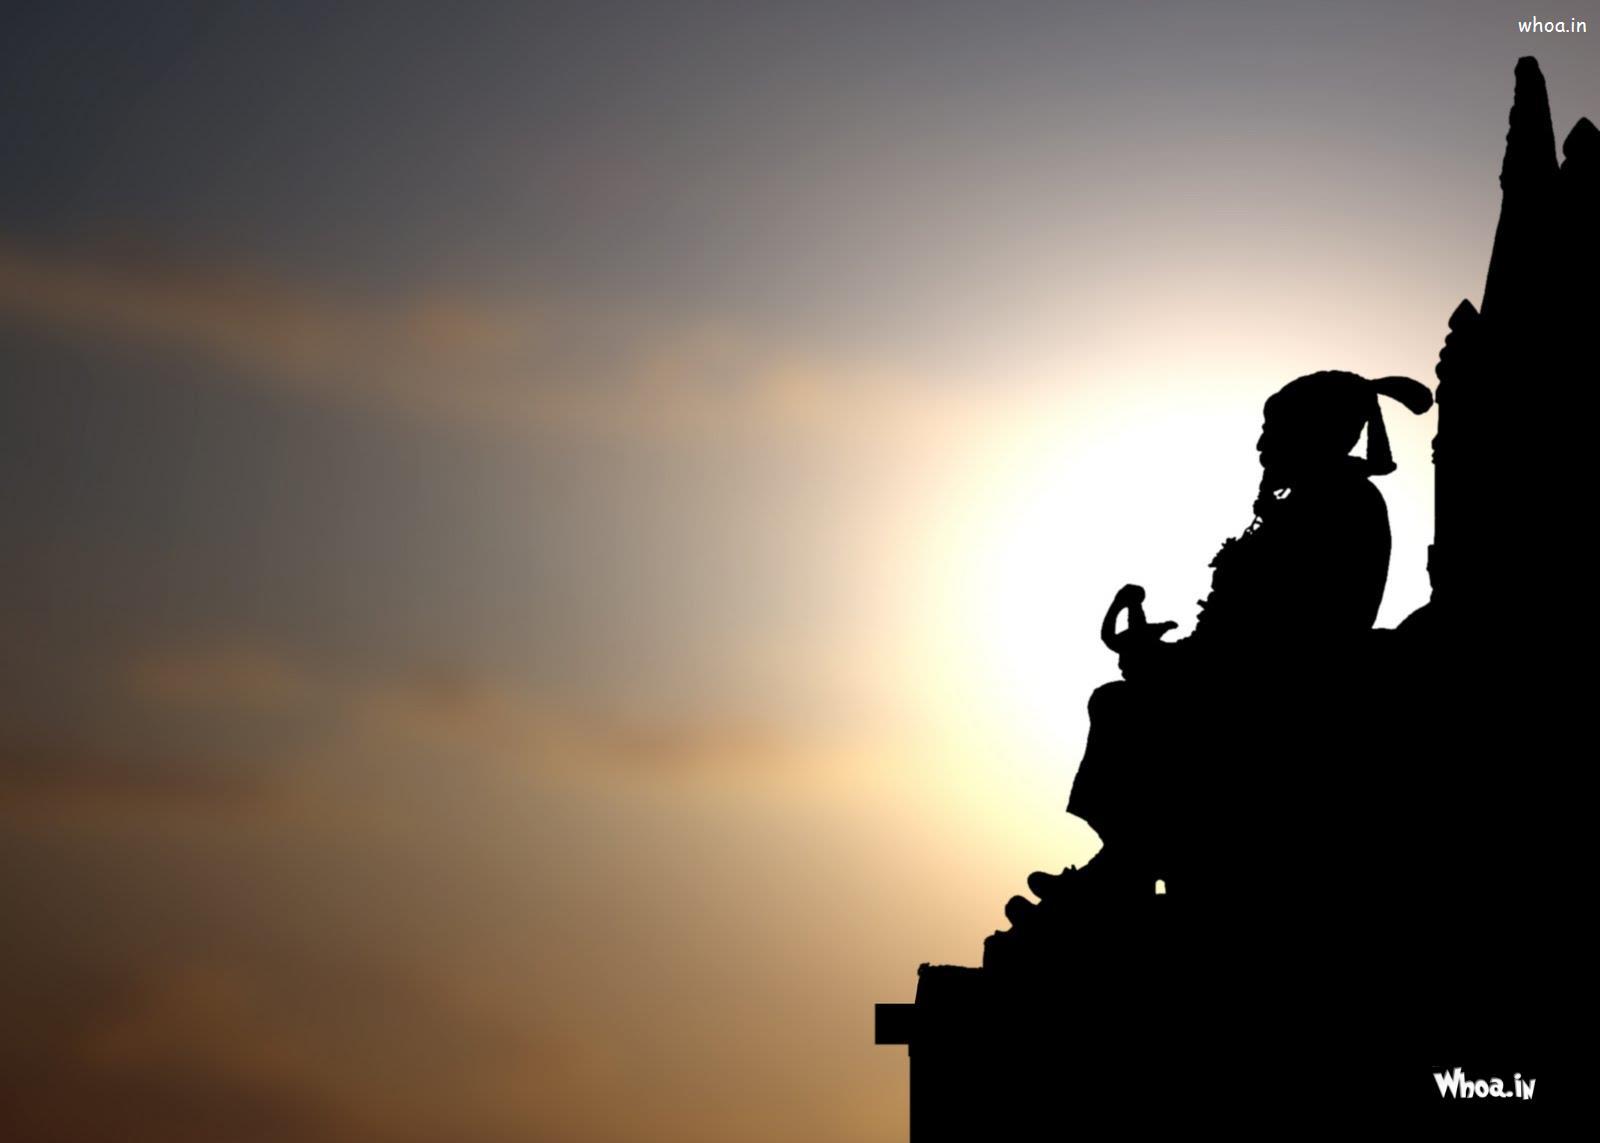 Shivaji Maharaj Statue With Sunset Hd Wallpaper